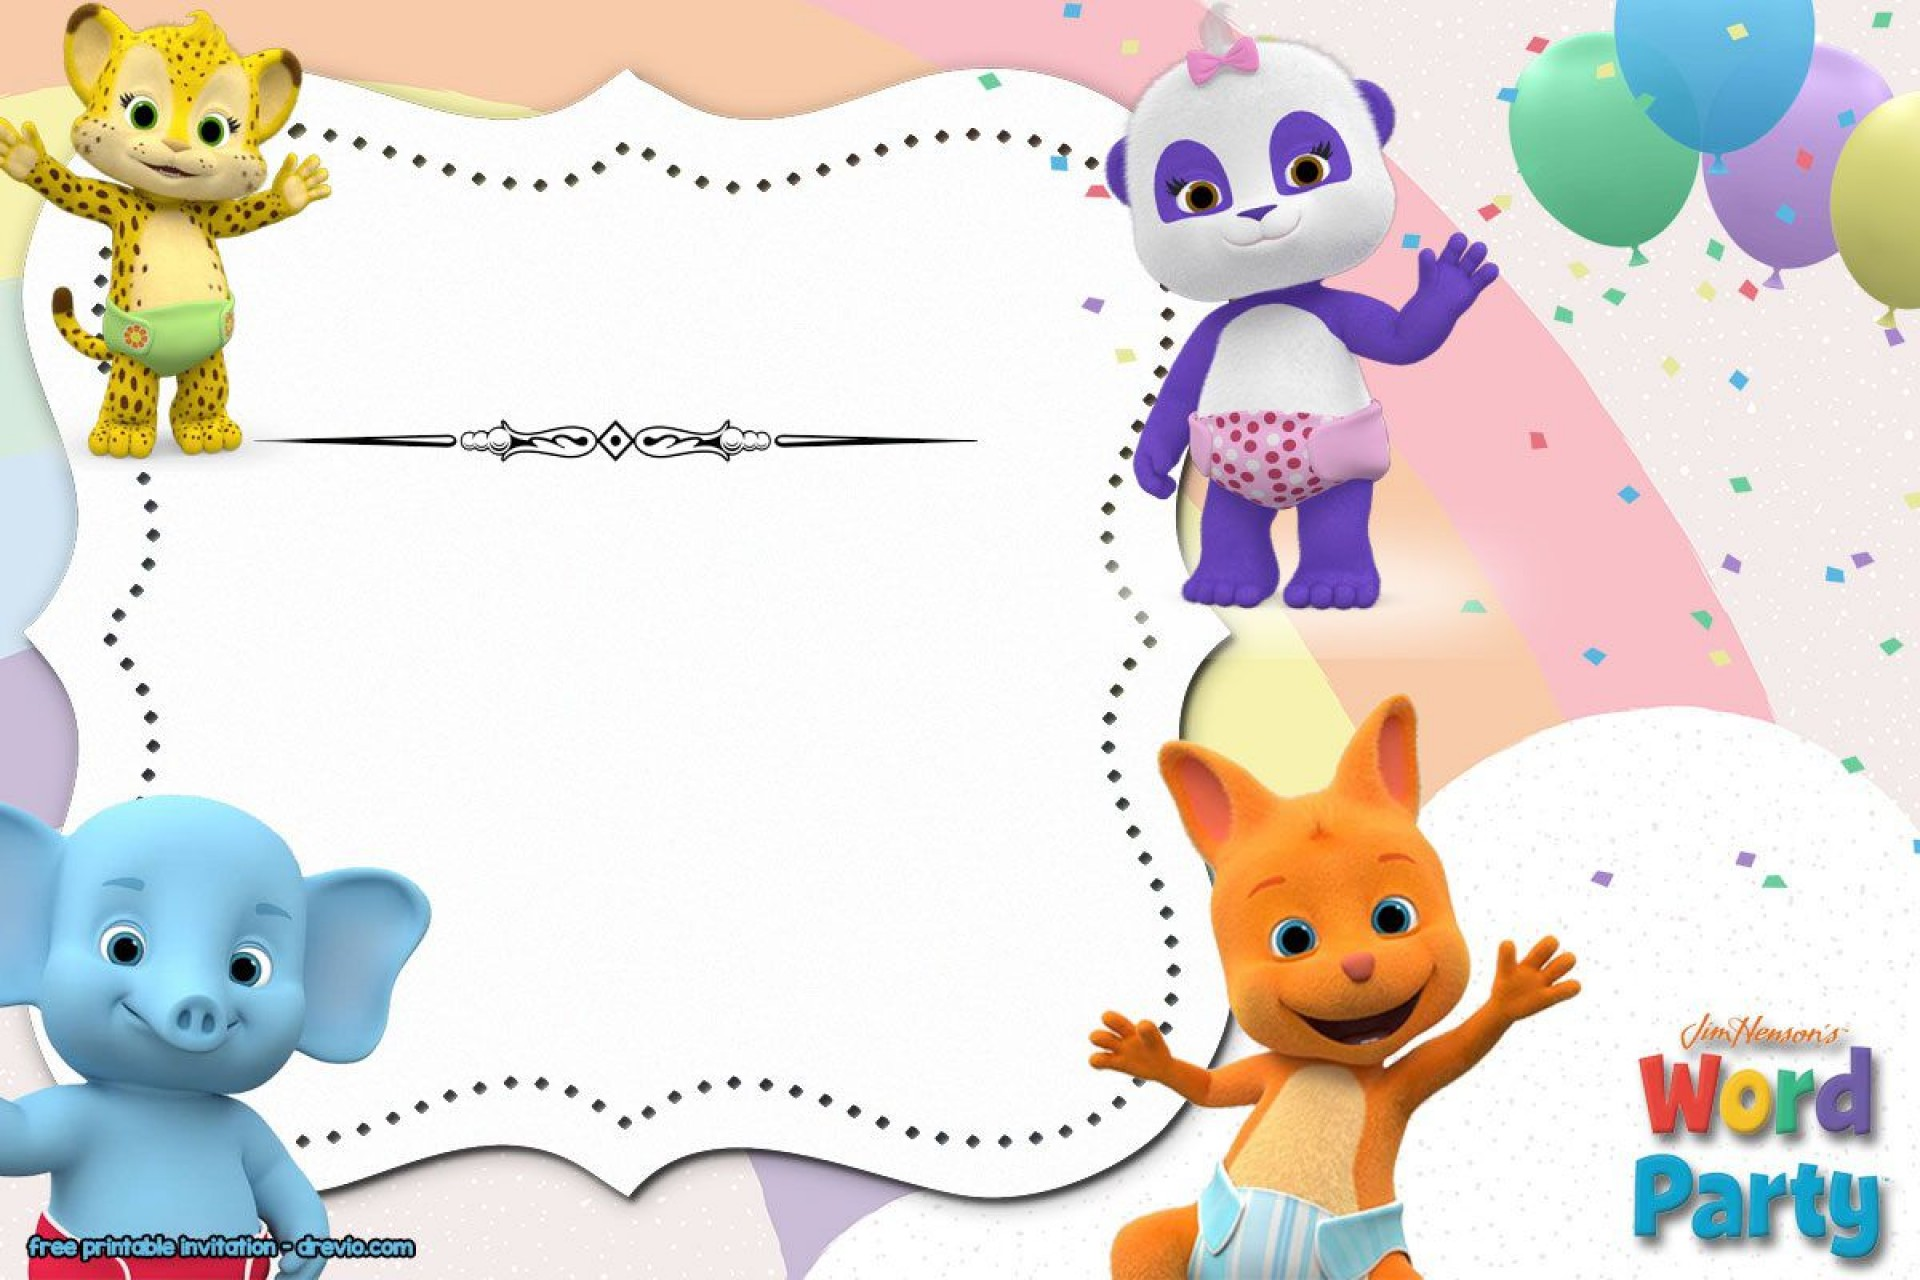 008 Astounding Birthday Party Invitation Template Word Highest Clarity  40th Wording Sample Unicorn Free1920